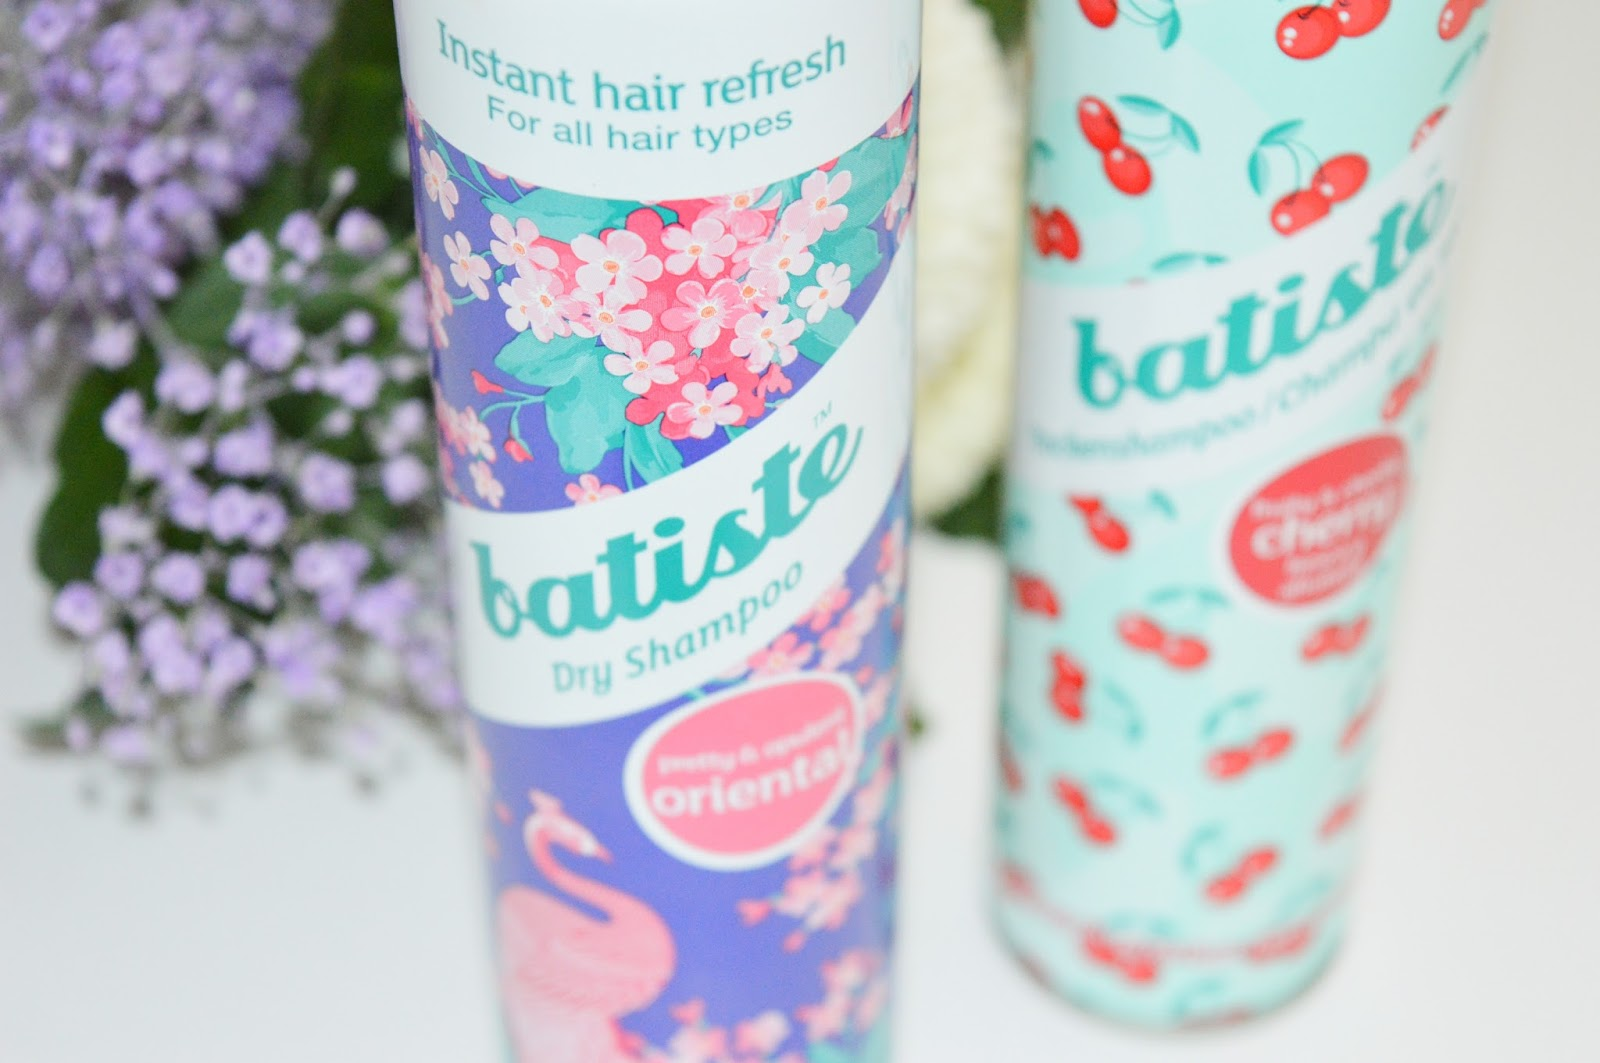 batiste best dry shampoo